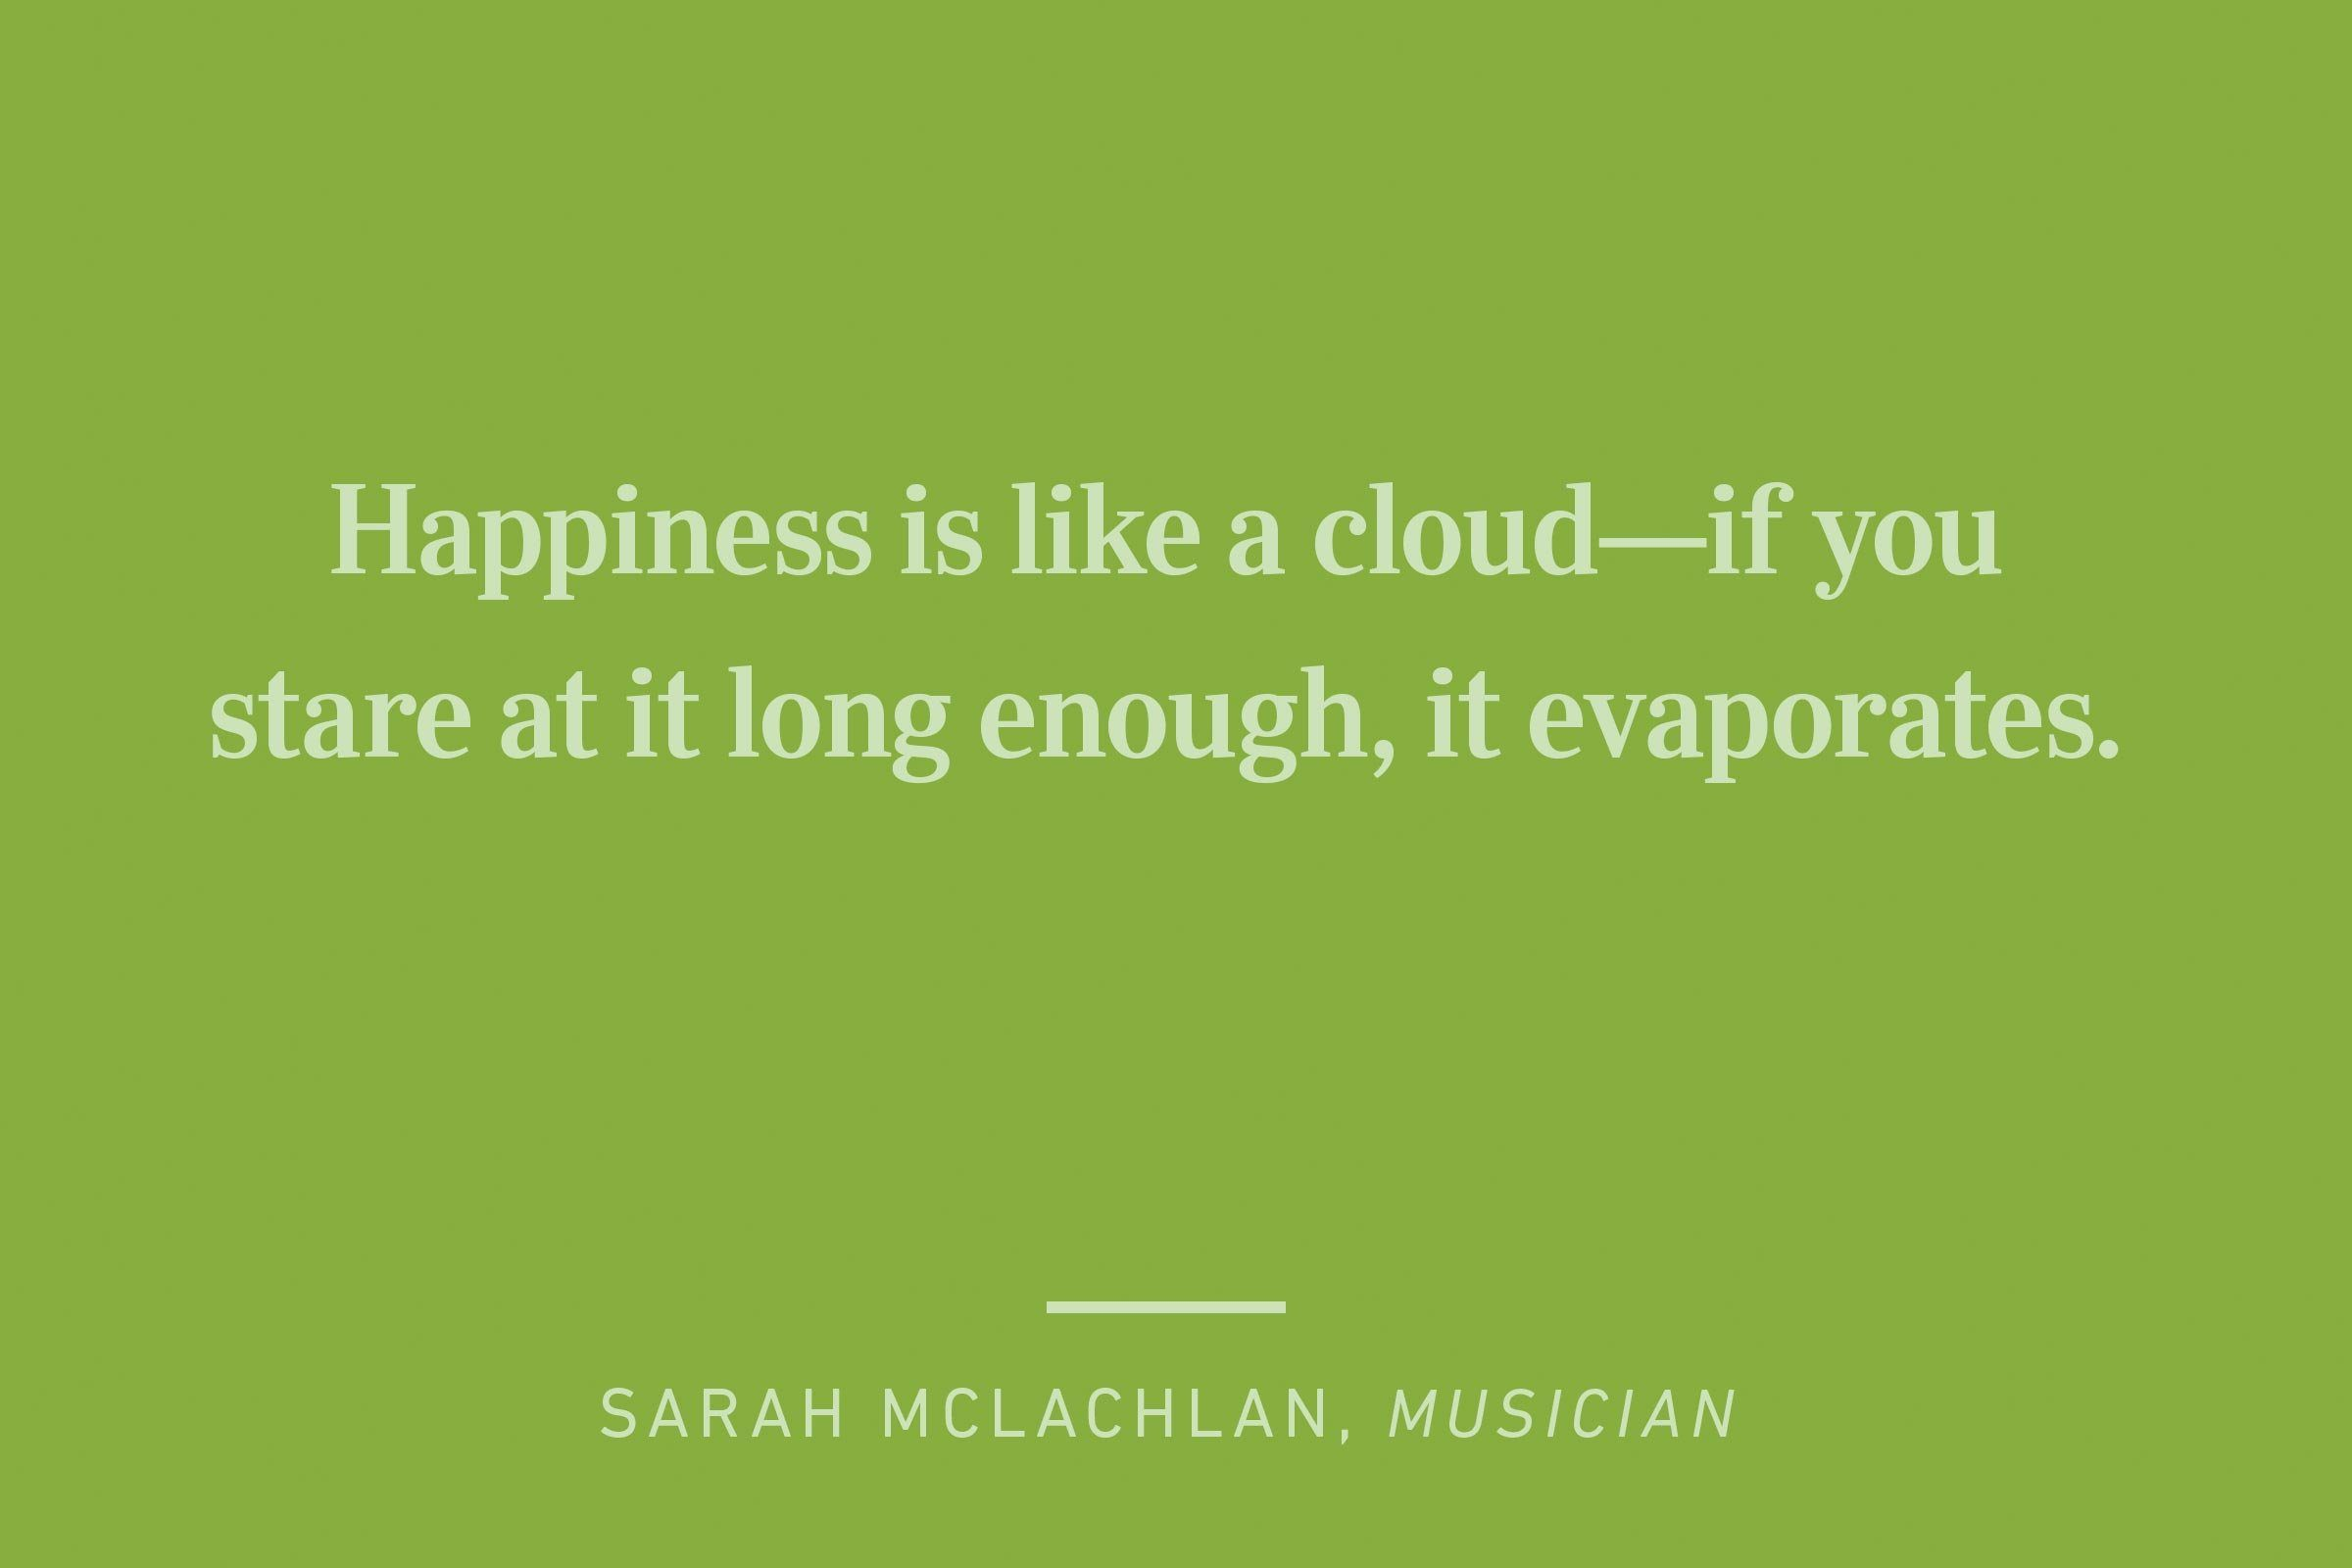 sara mclachlan happiness quote